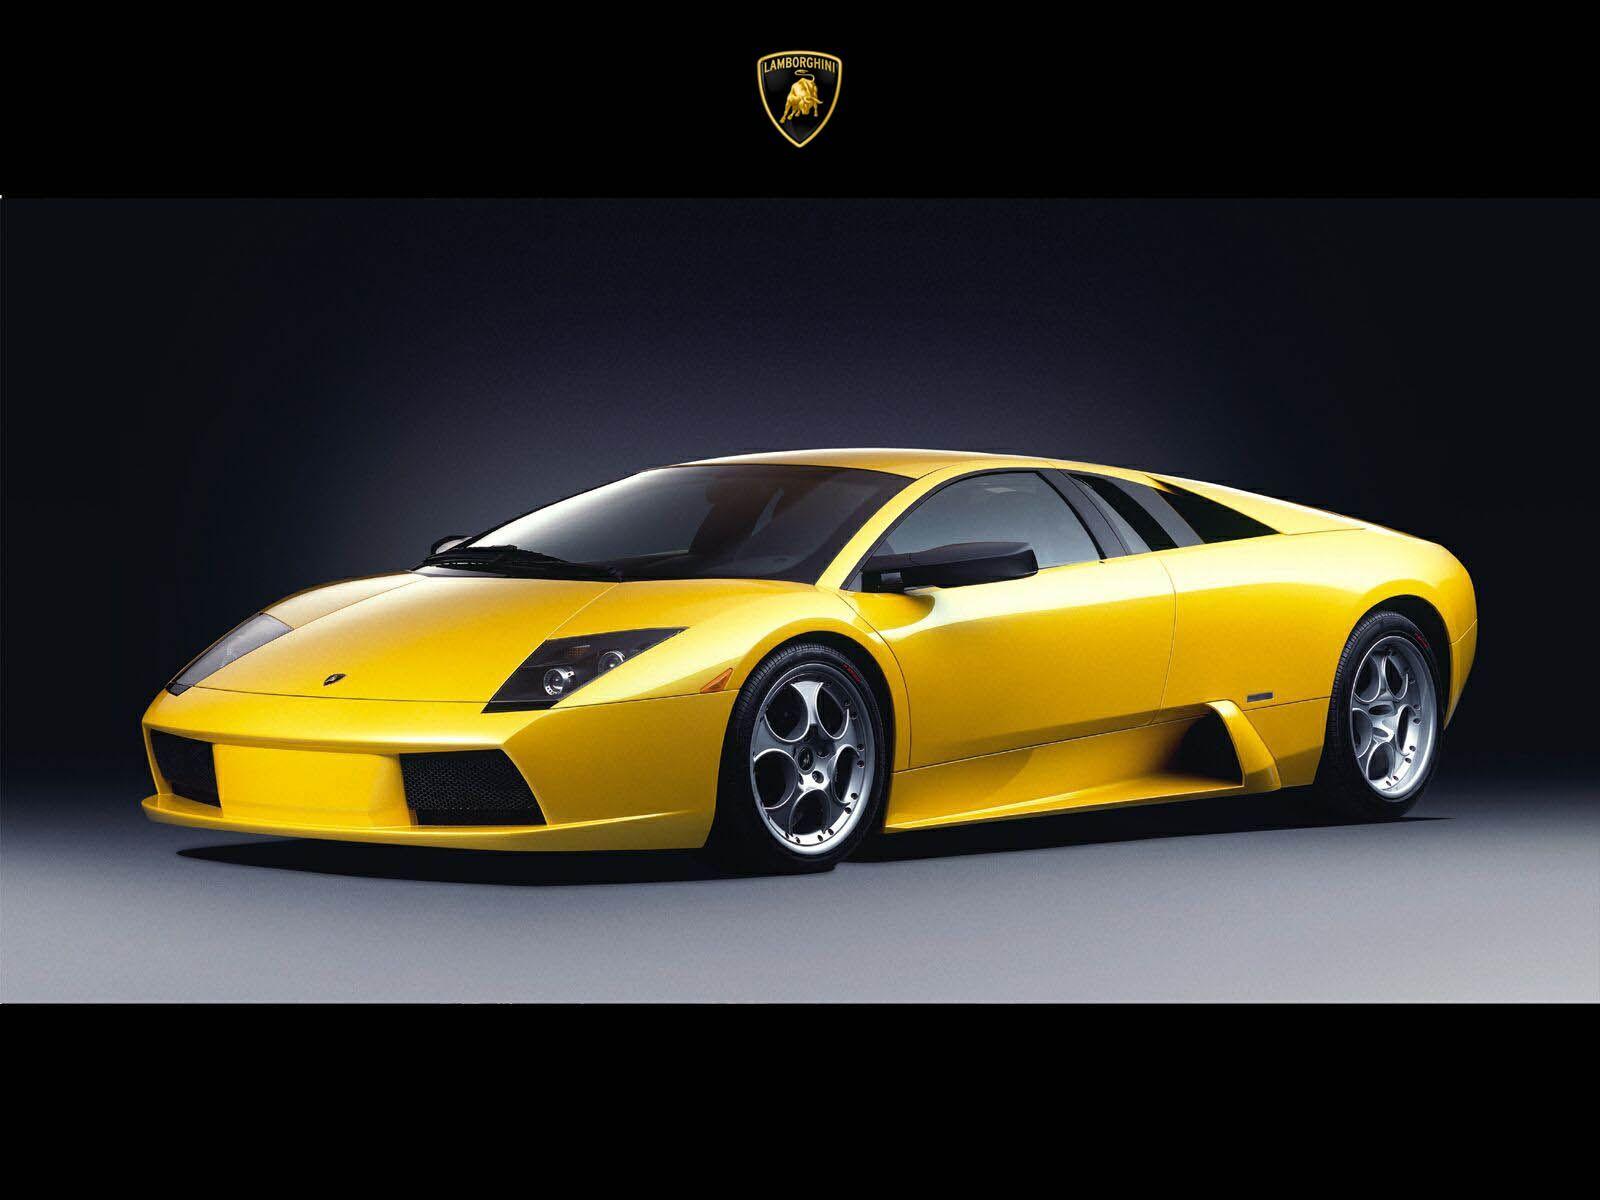 Car Galleries صور سيارات Car Pictures News صور و أخبار عالم سيارات Vehicles Car Lamborghini